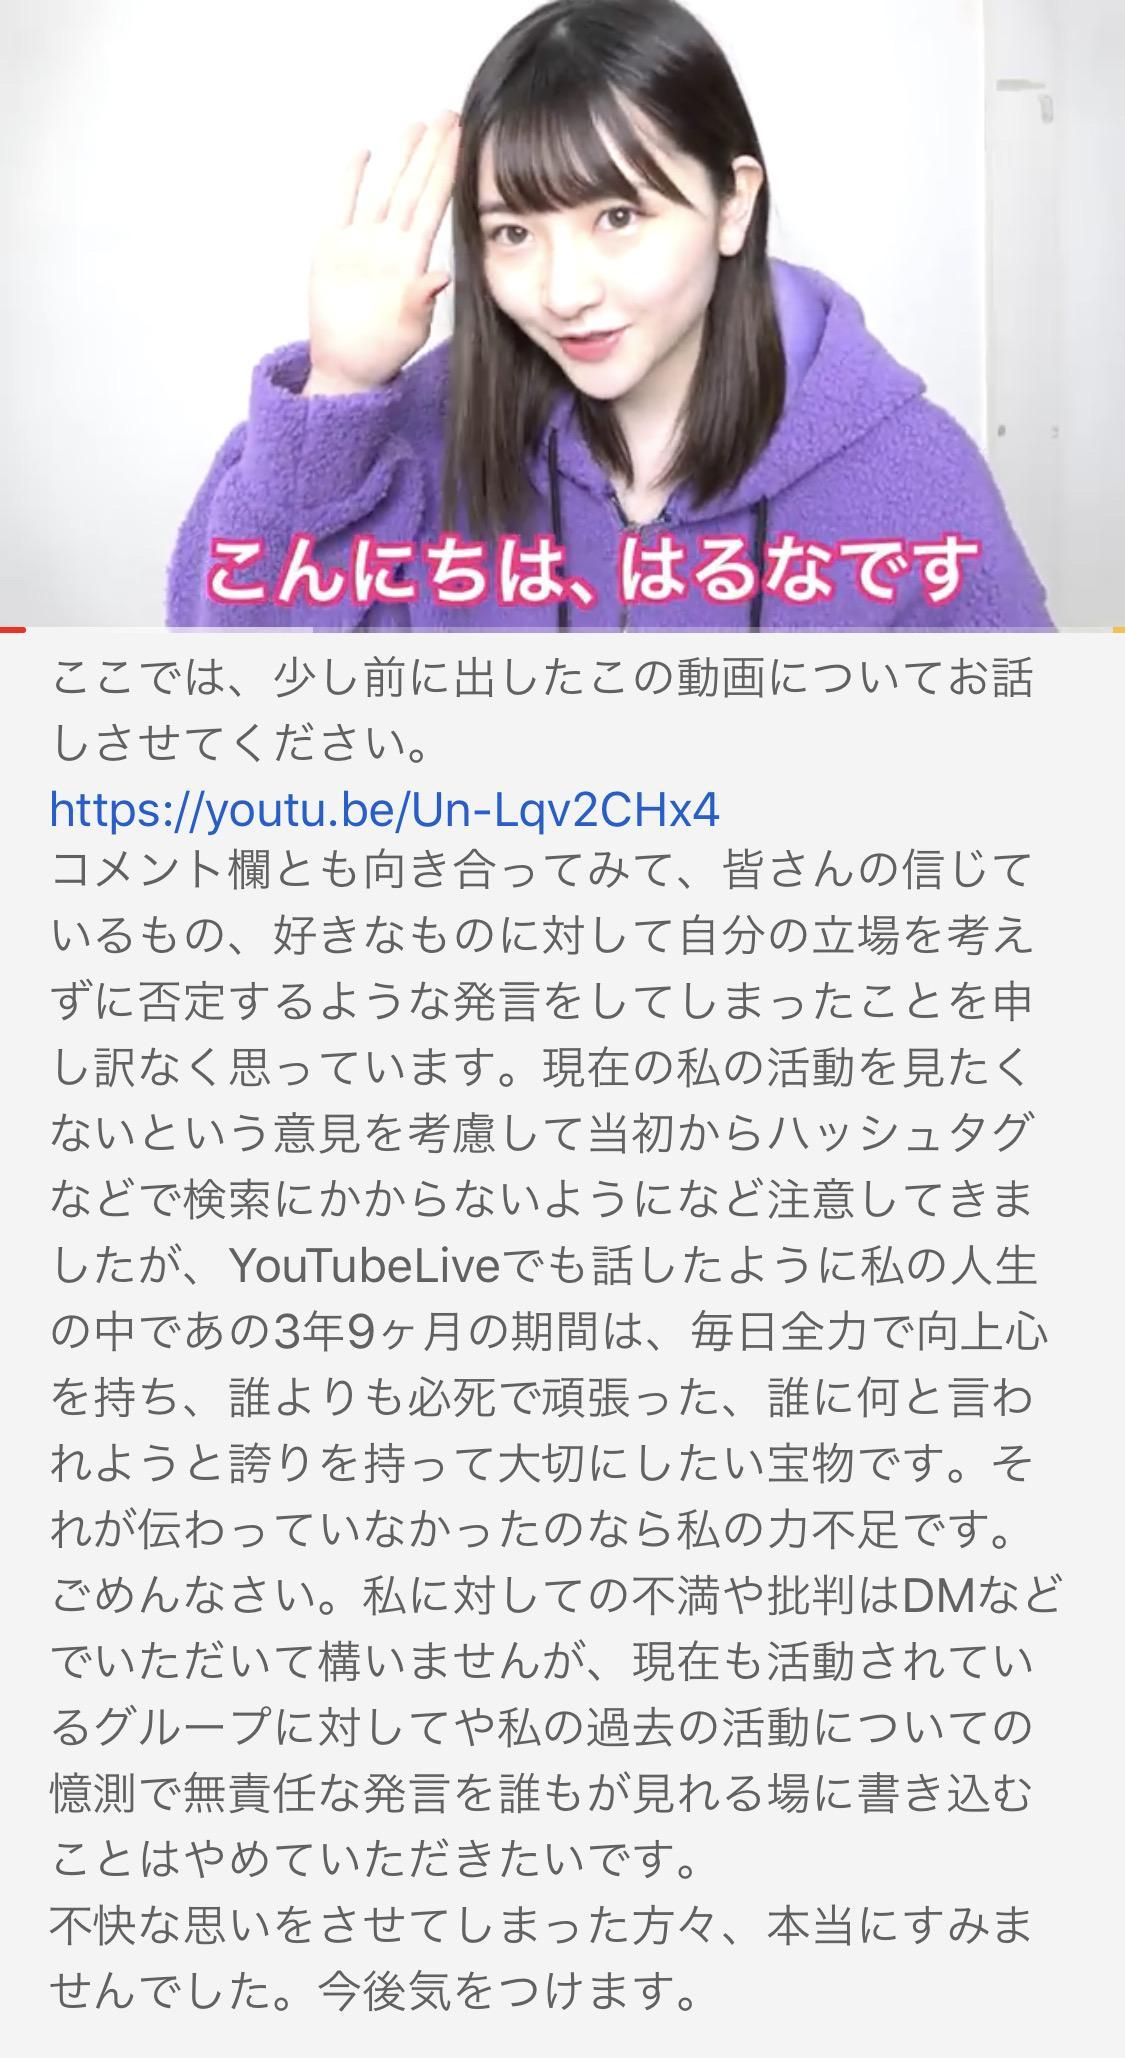 http://www.mybitchisajunky.com/whg/picture/Z3TVIAM_5e0d0a3d7d9b1.jpg